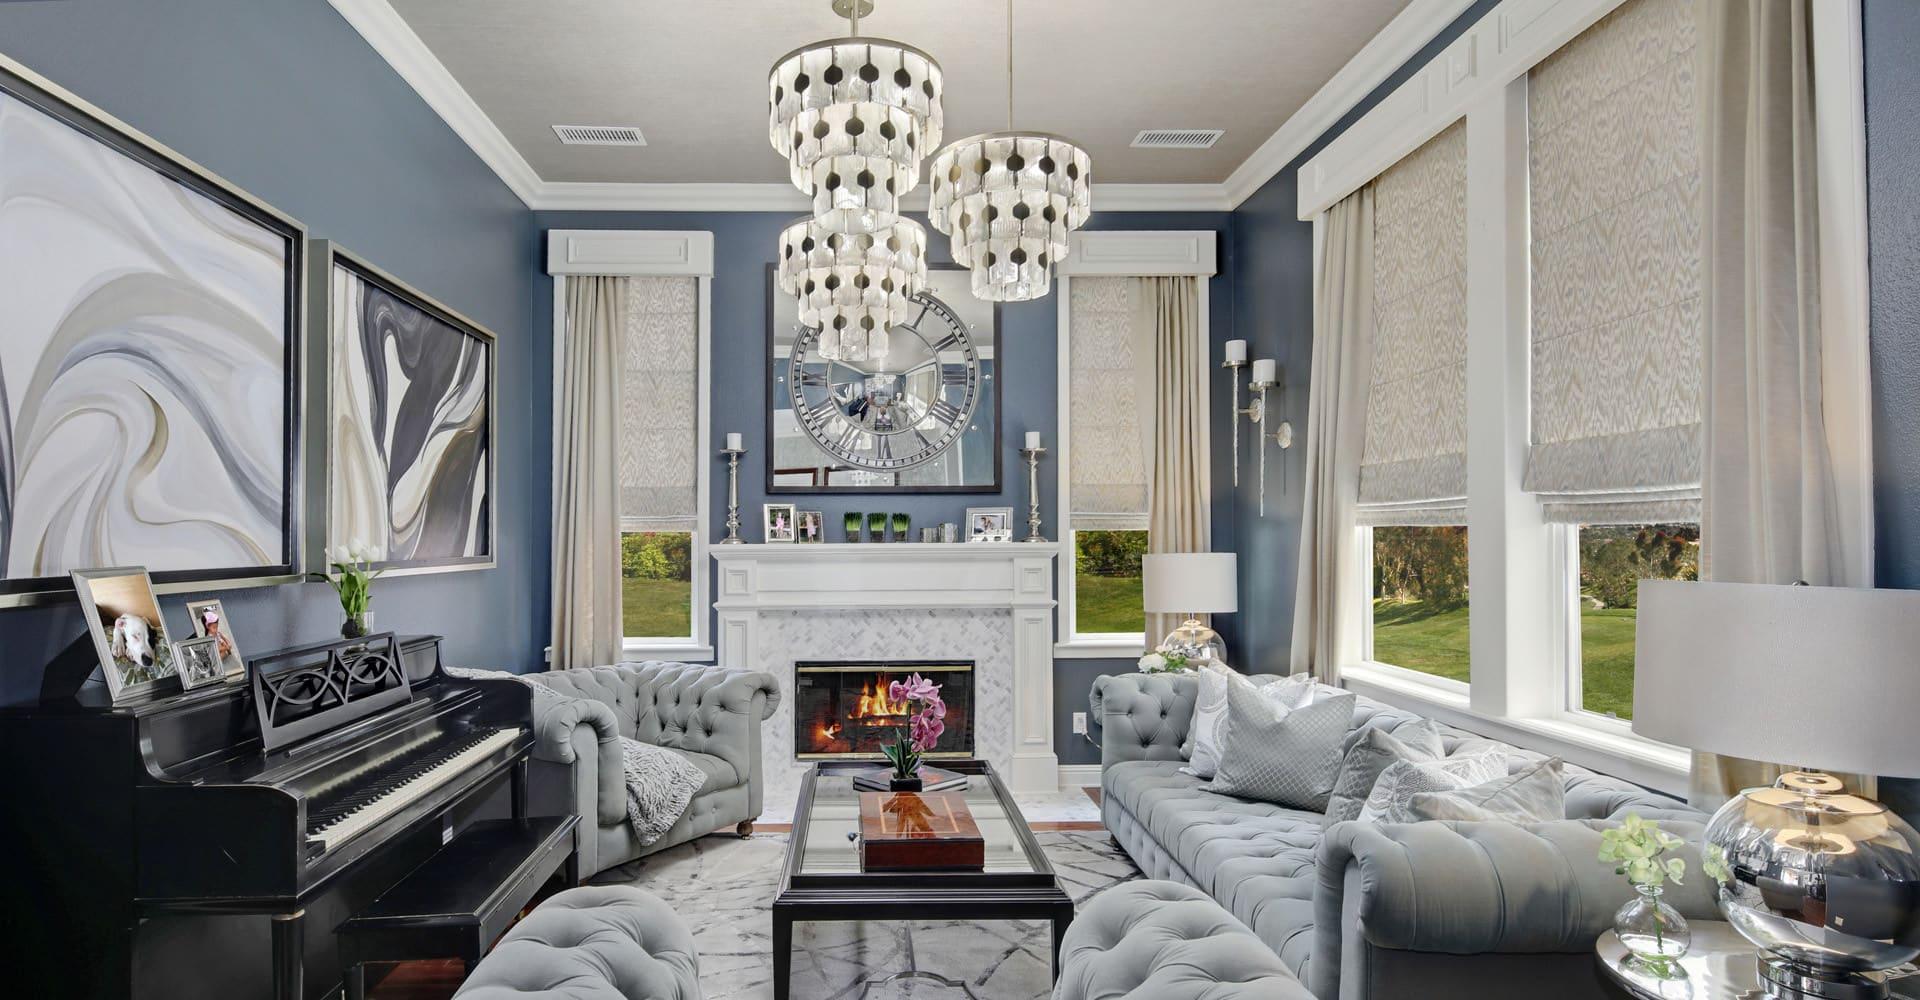 Award Winning Newport Coast Interior Designers 27 Diamonds Interior Design